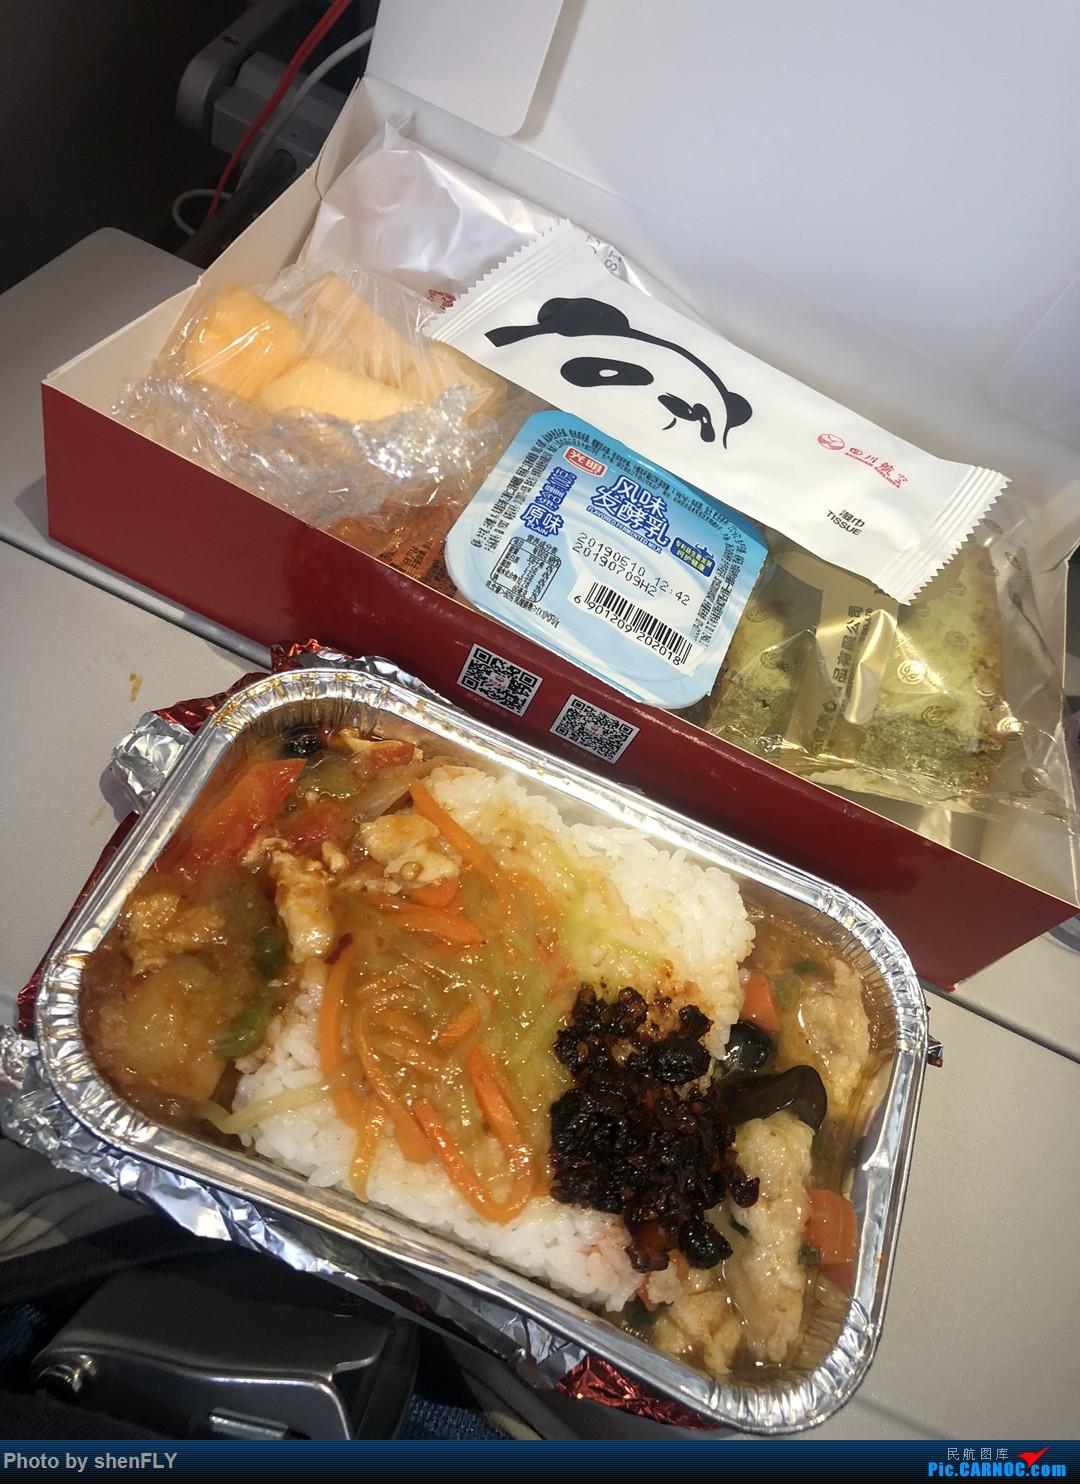 Re:[原创]【川航第二架熊猫A359飞行游记】跟着熊猫飞天游,品鉴川航优质餐